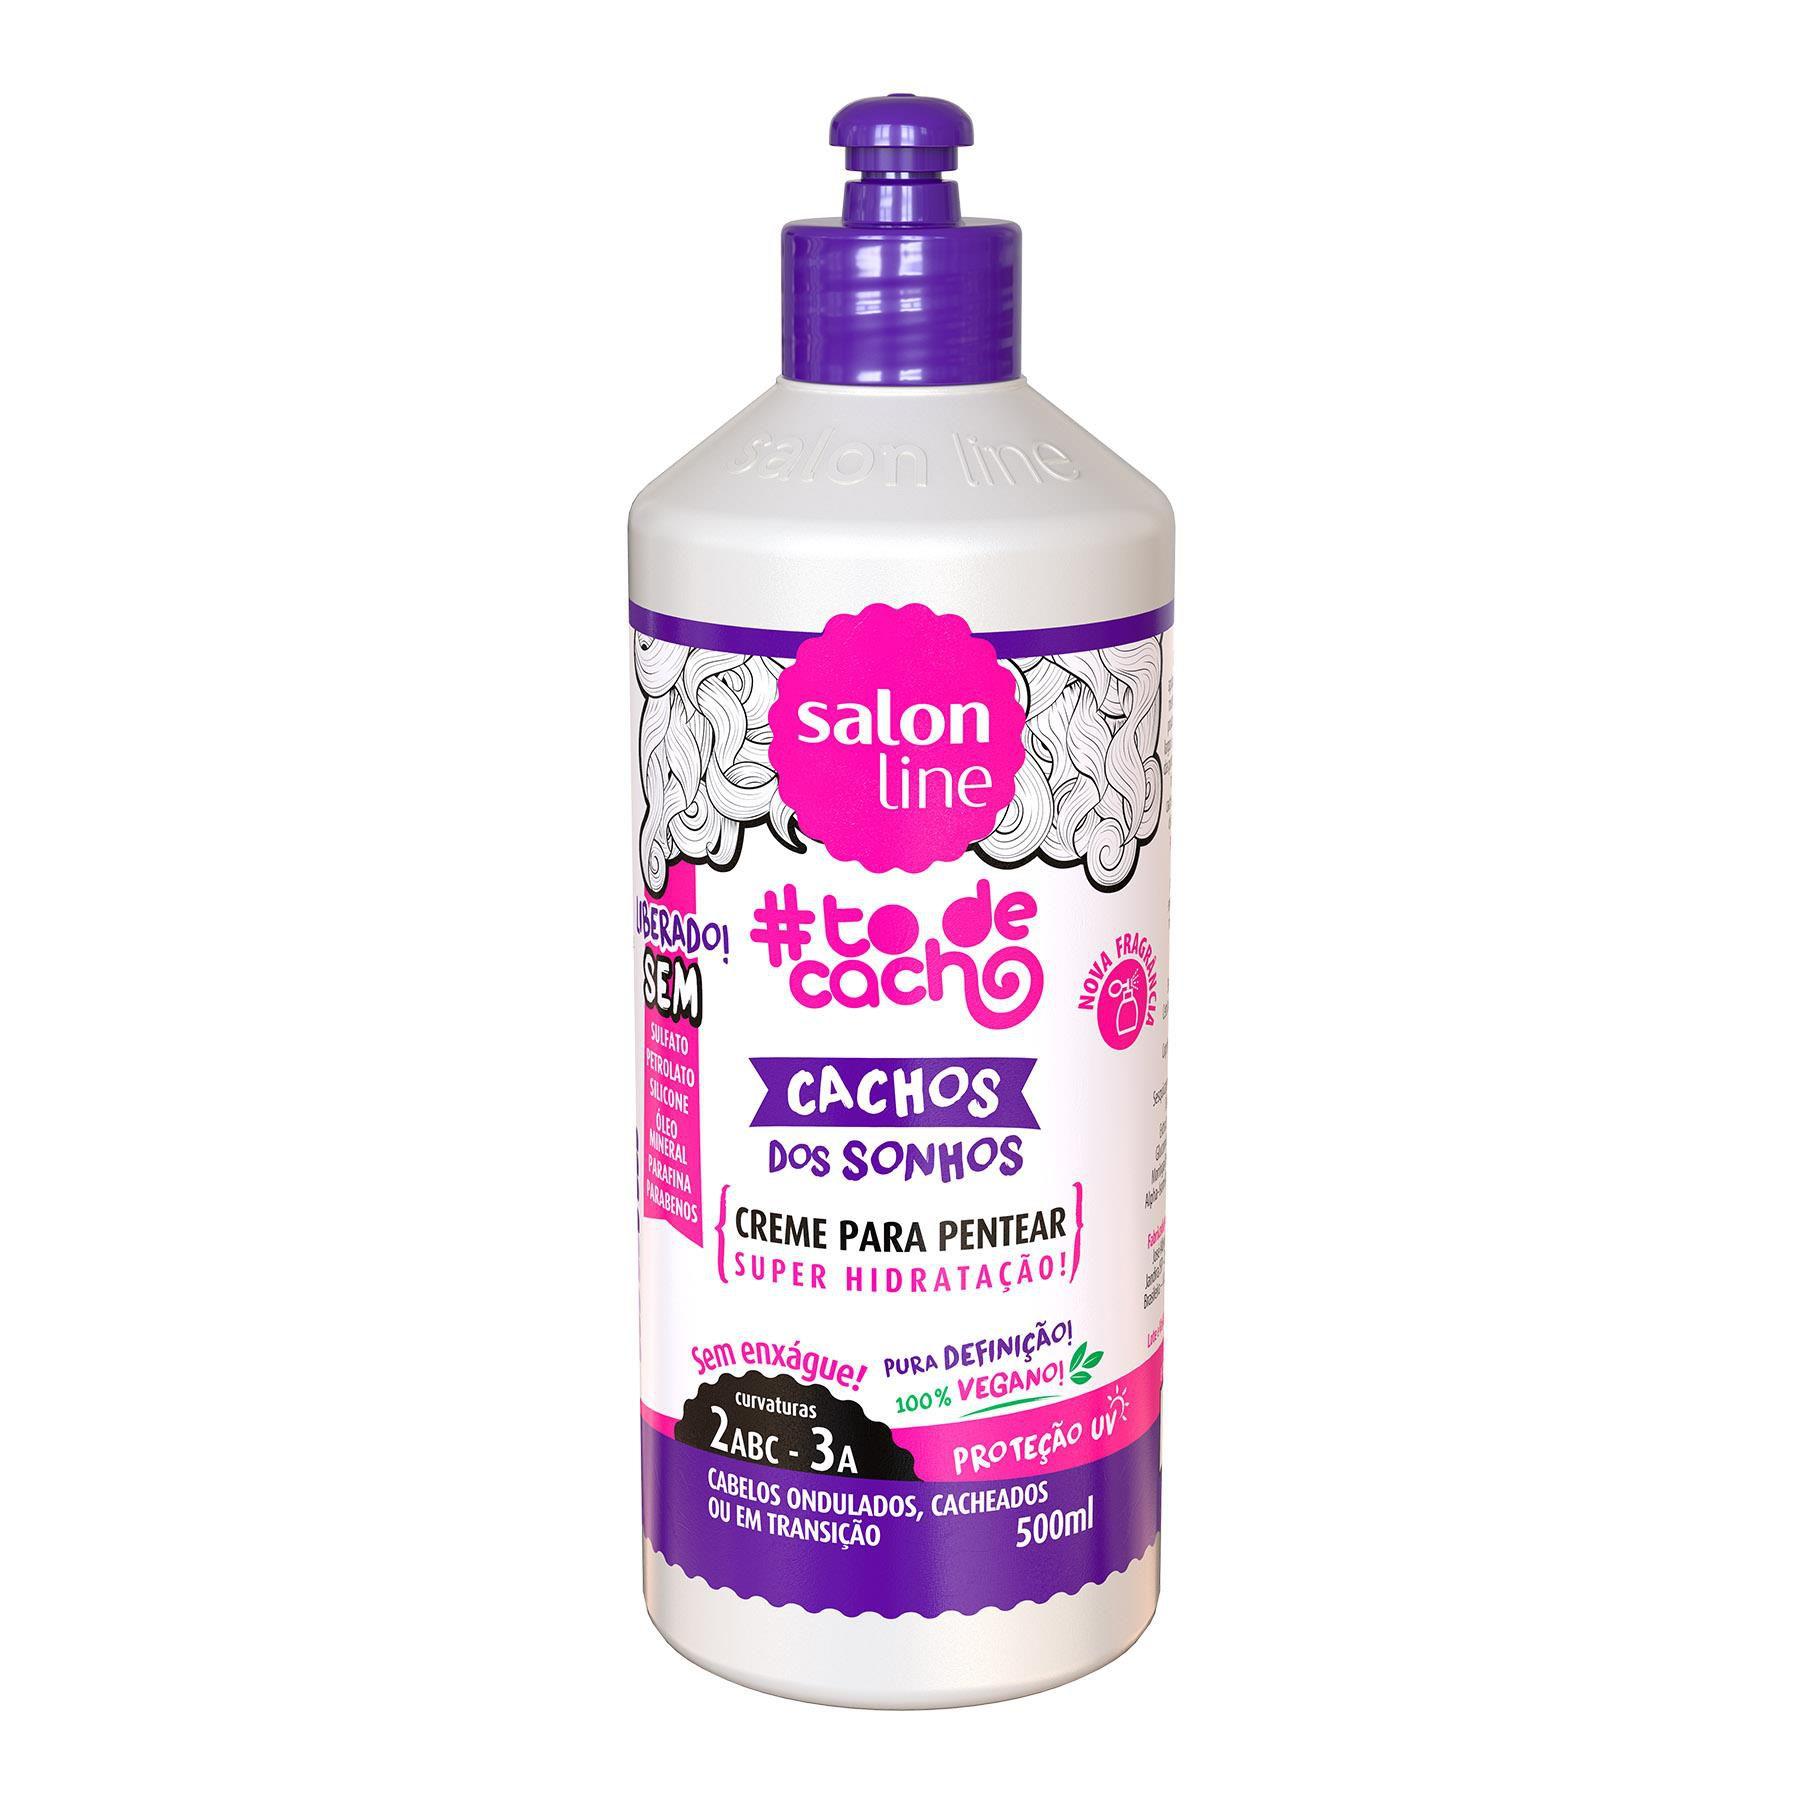 Salon Line Creme para Pentear #TodeCacho Cachos dos Sonhos 500ml